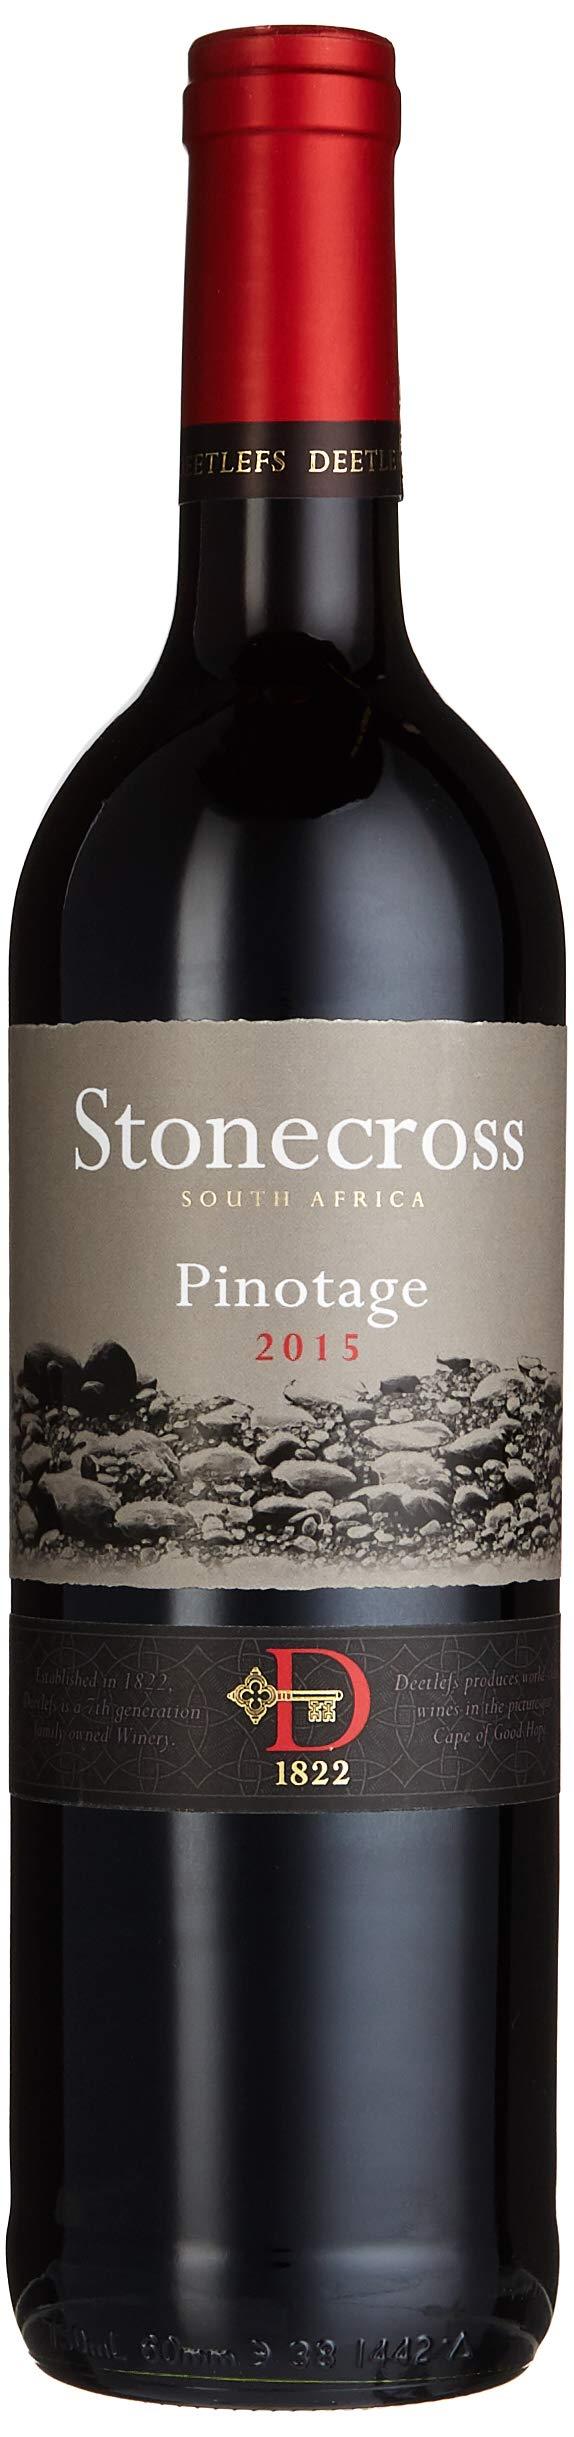 Deetlefs-Estate-Stonecross-Pinotage-2012-Trocken-6-x-075-l